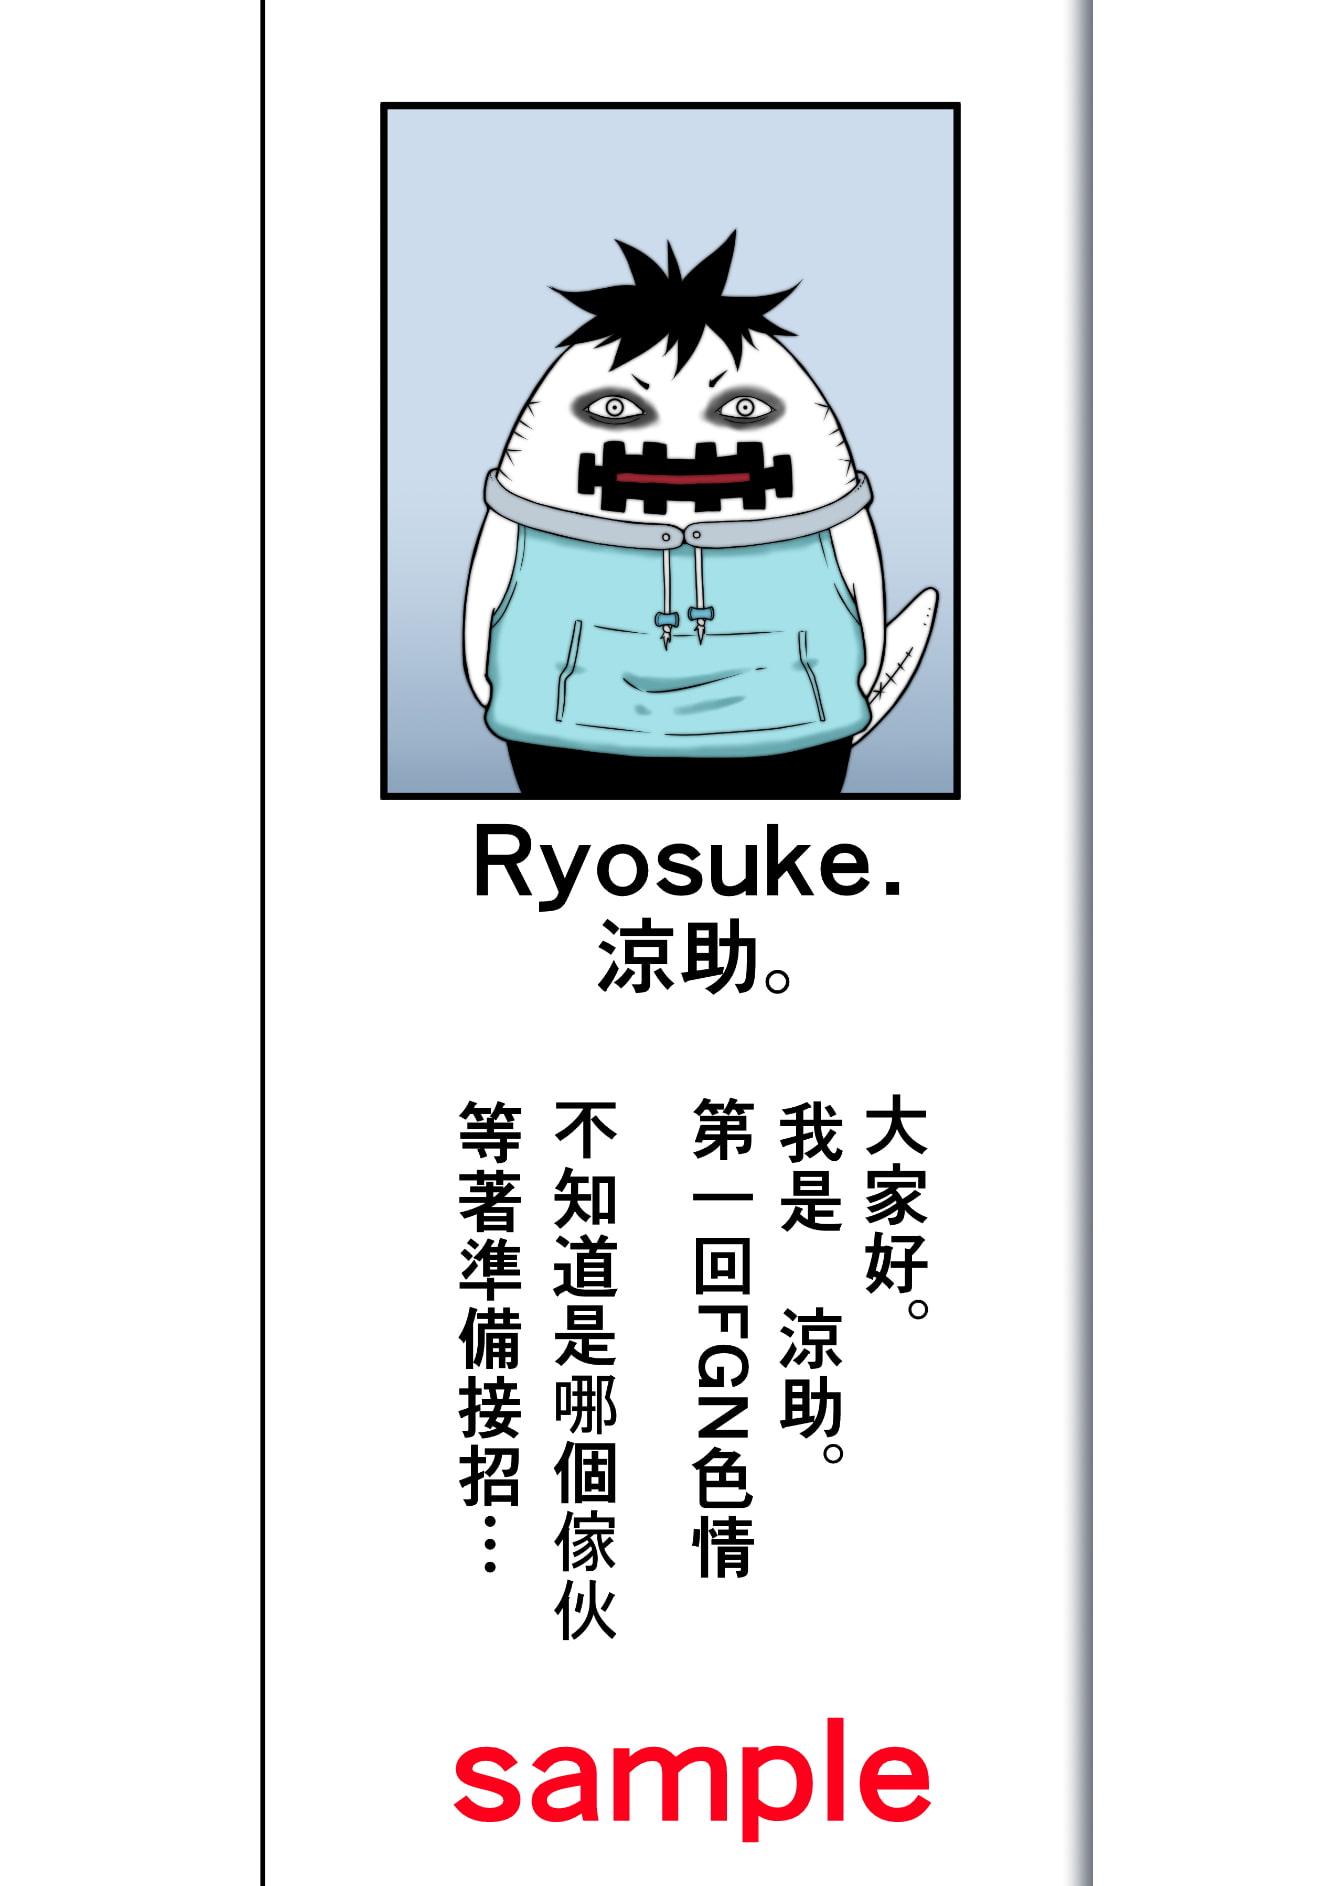 Fighting Game New 3.5  繁体中文 ver.のサンプル画像